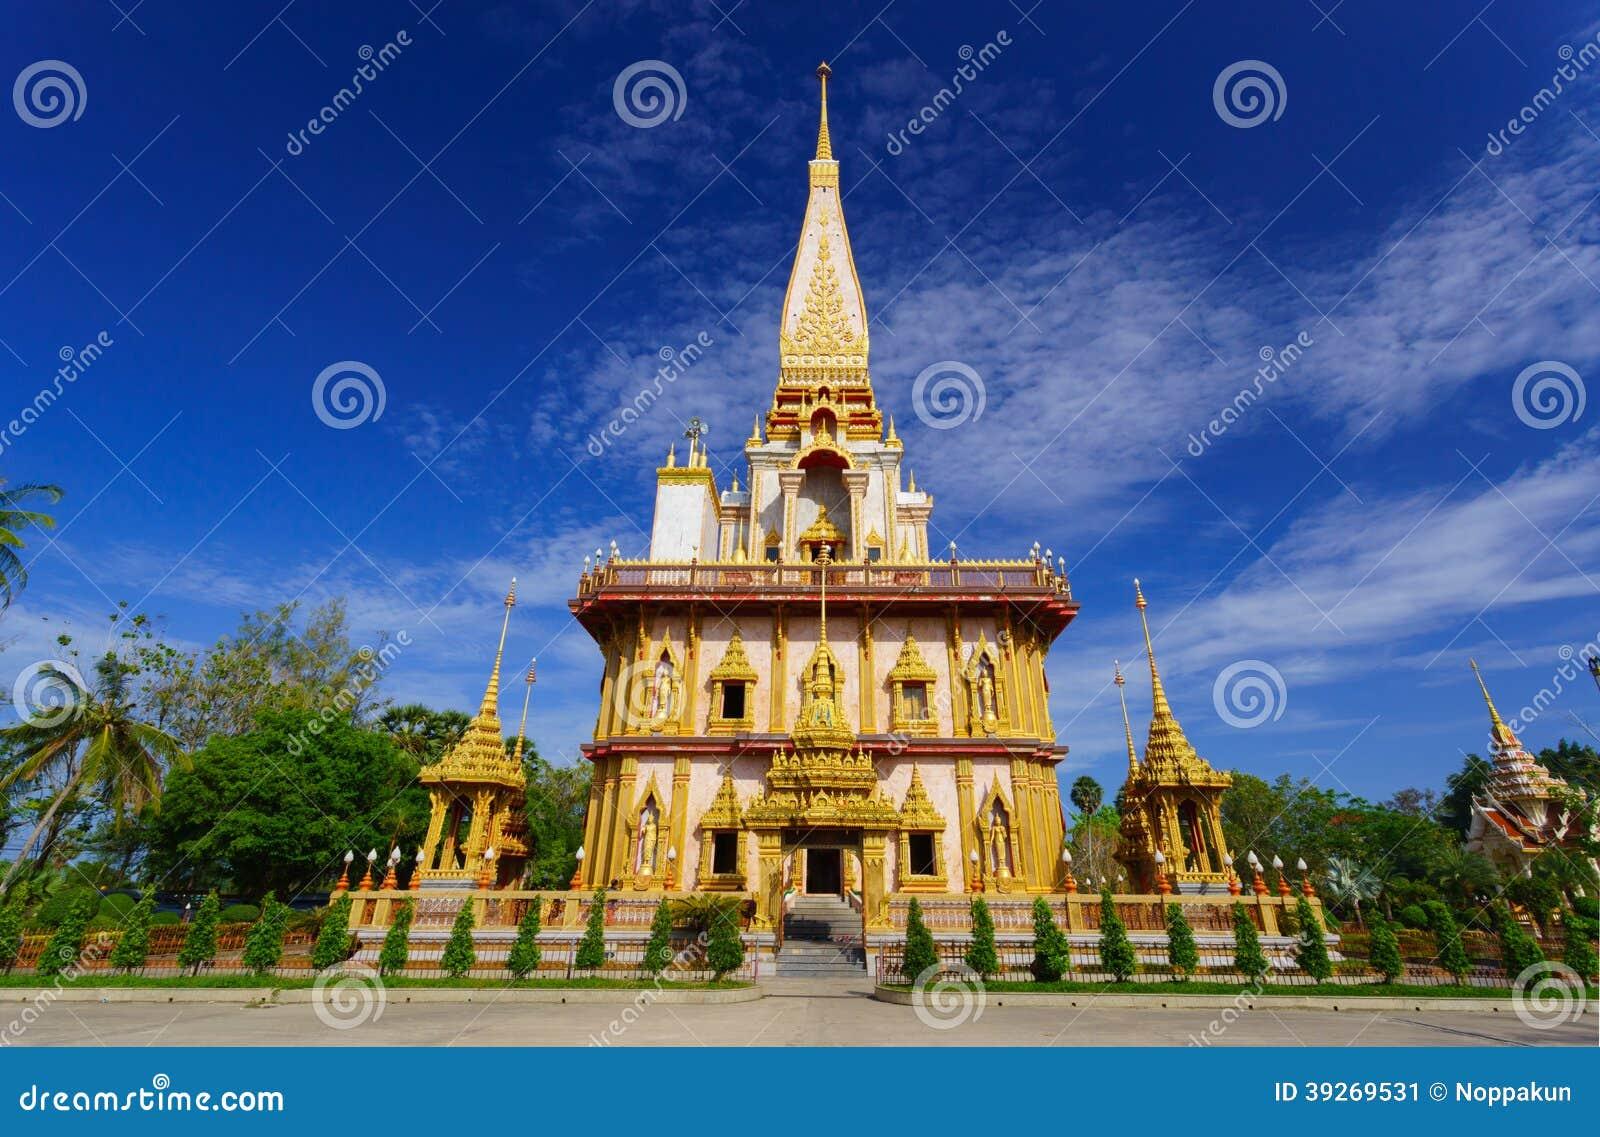 Висок Пхукет Wat Chalong, Таиланд